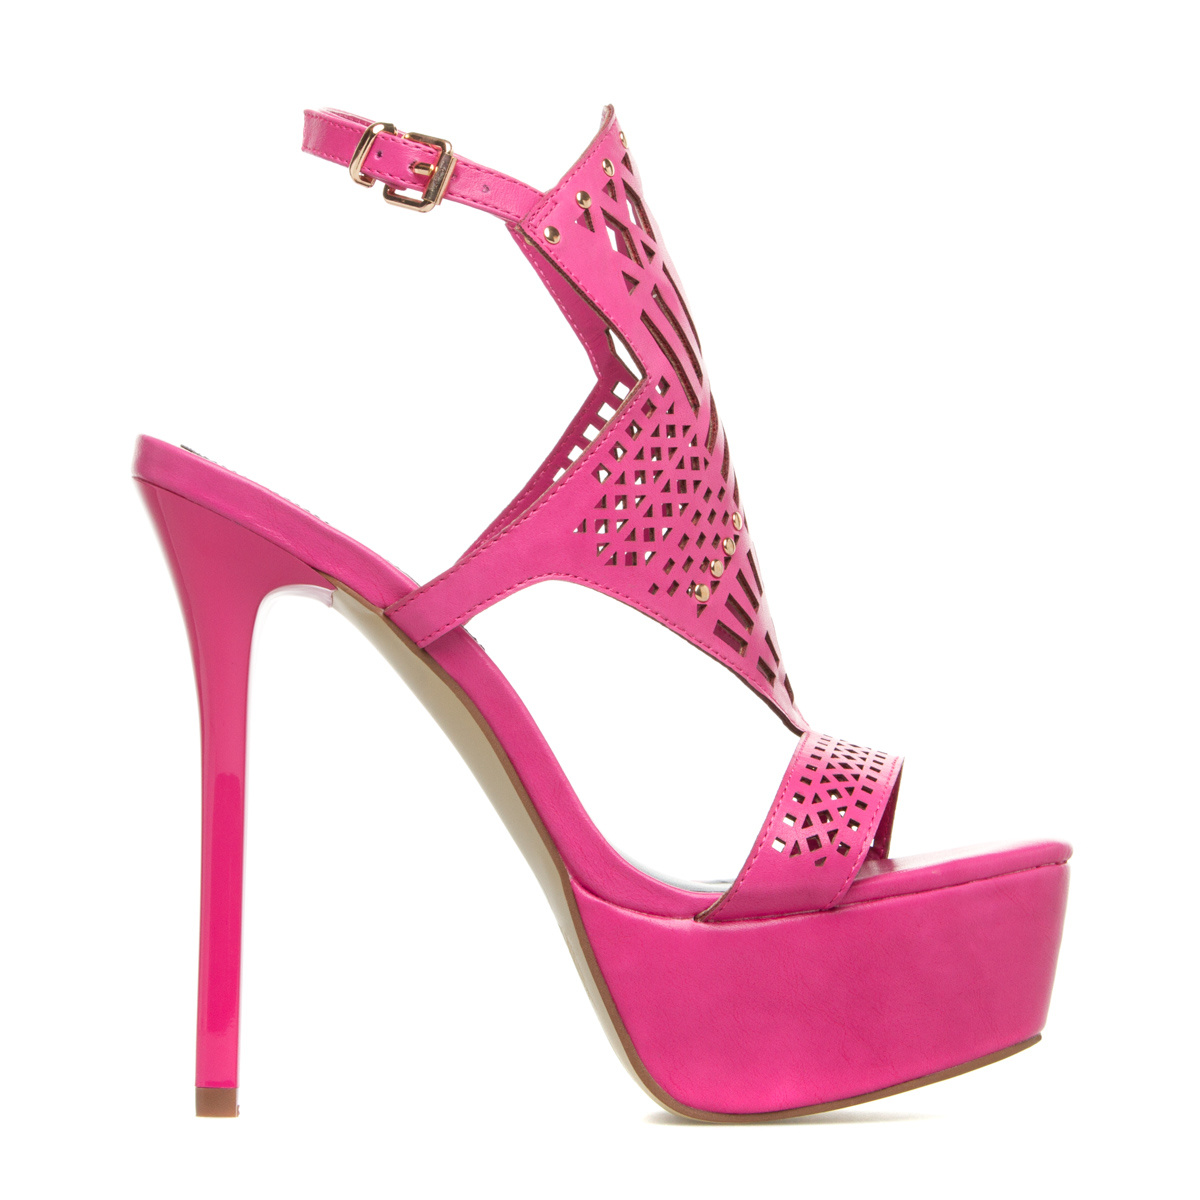 """""ShoeDazzle Sandals-Dressy - Platform Teva Womens Pink Size 6.5"""""" DA1511956-7610-35065"